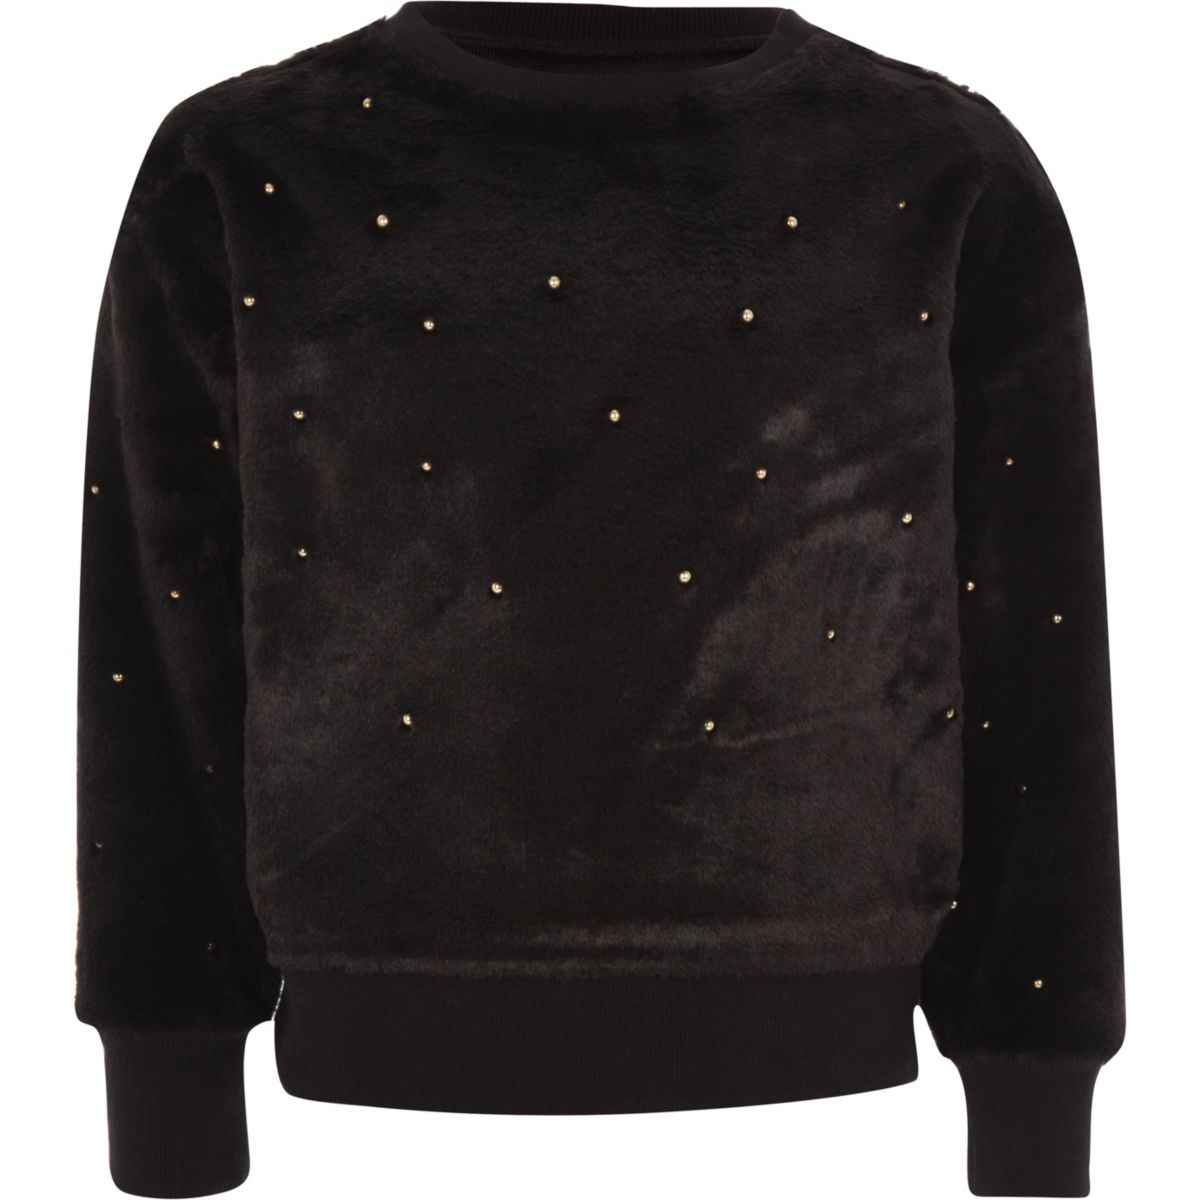 Girls black faux fur pearl embellished sweater